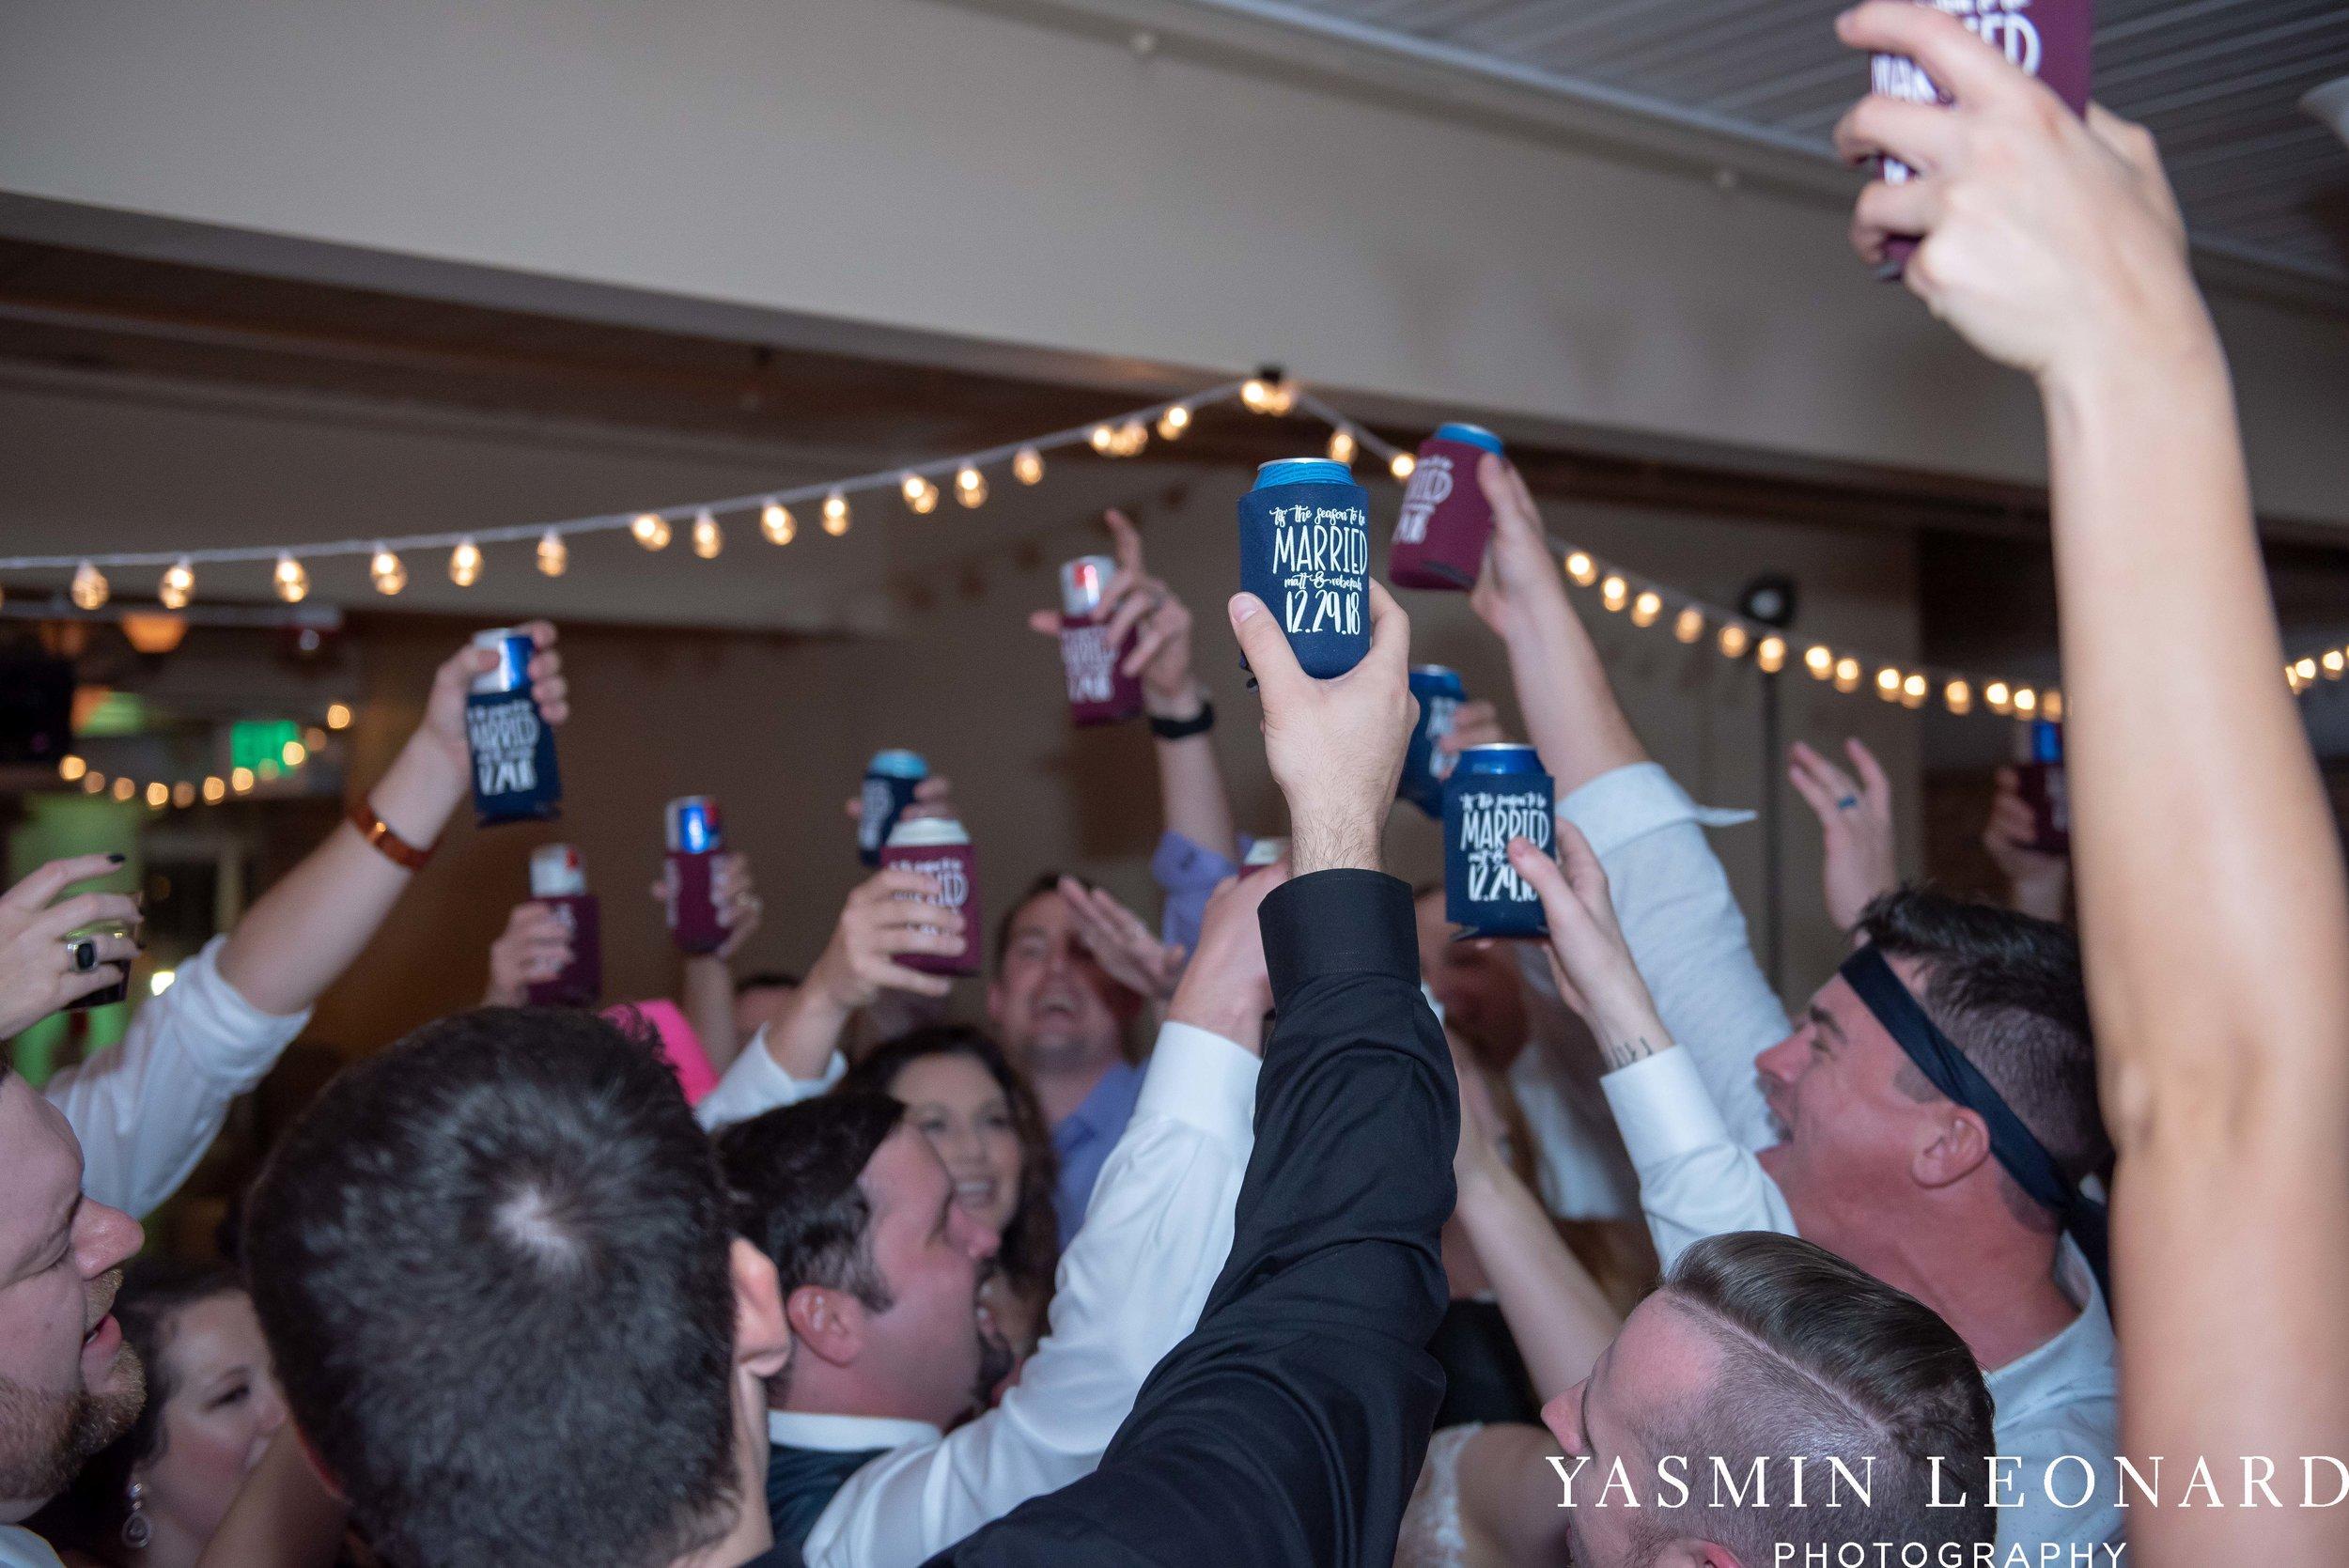 Rebekah and Matt - 105 Worth Event Centre - Yasmin Leonard Photography - Asheboro Wedding - NC Wedding - High Point Weddings - Triad Weddings - Winter Wedding-83.jpg